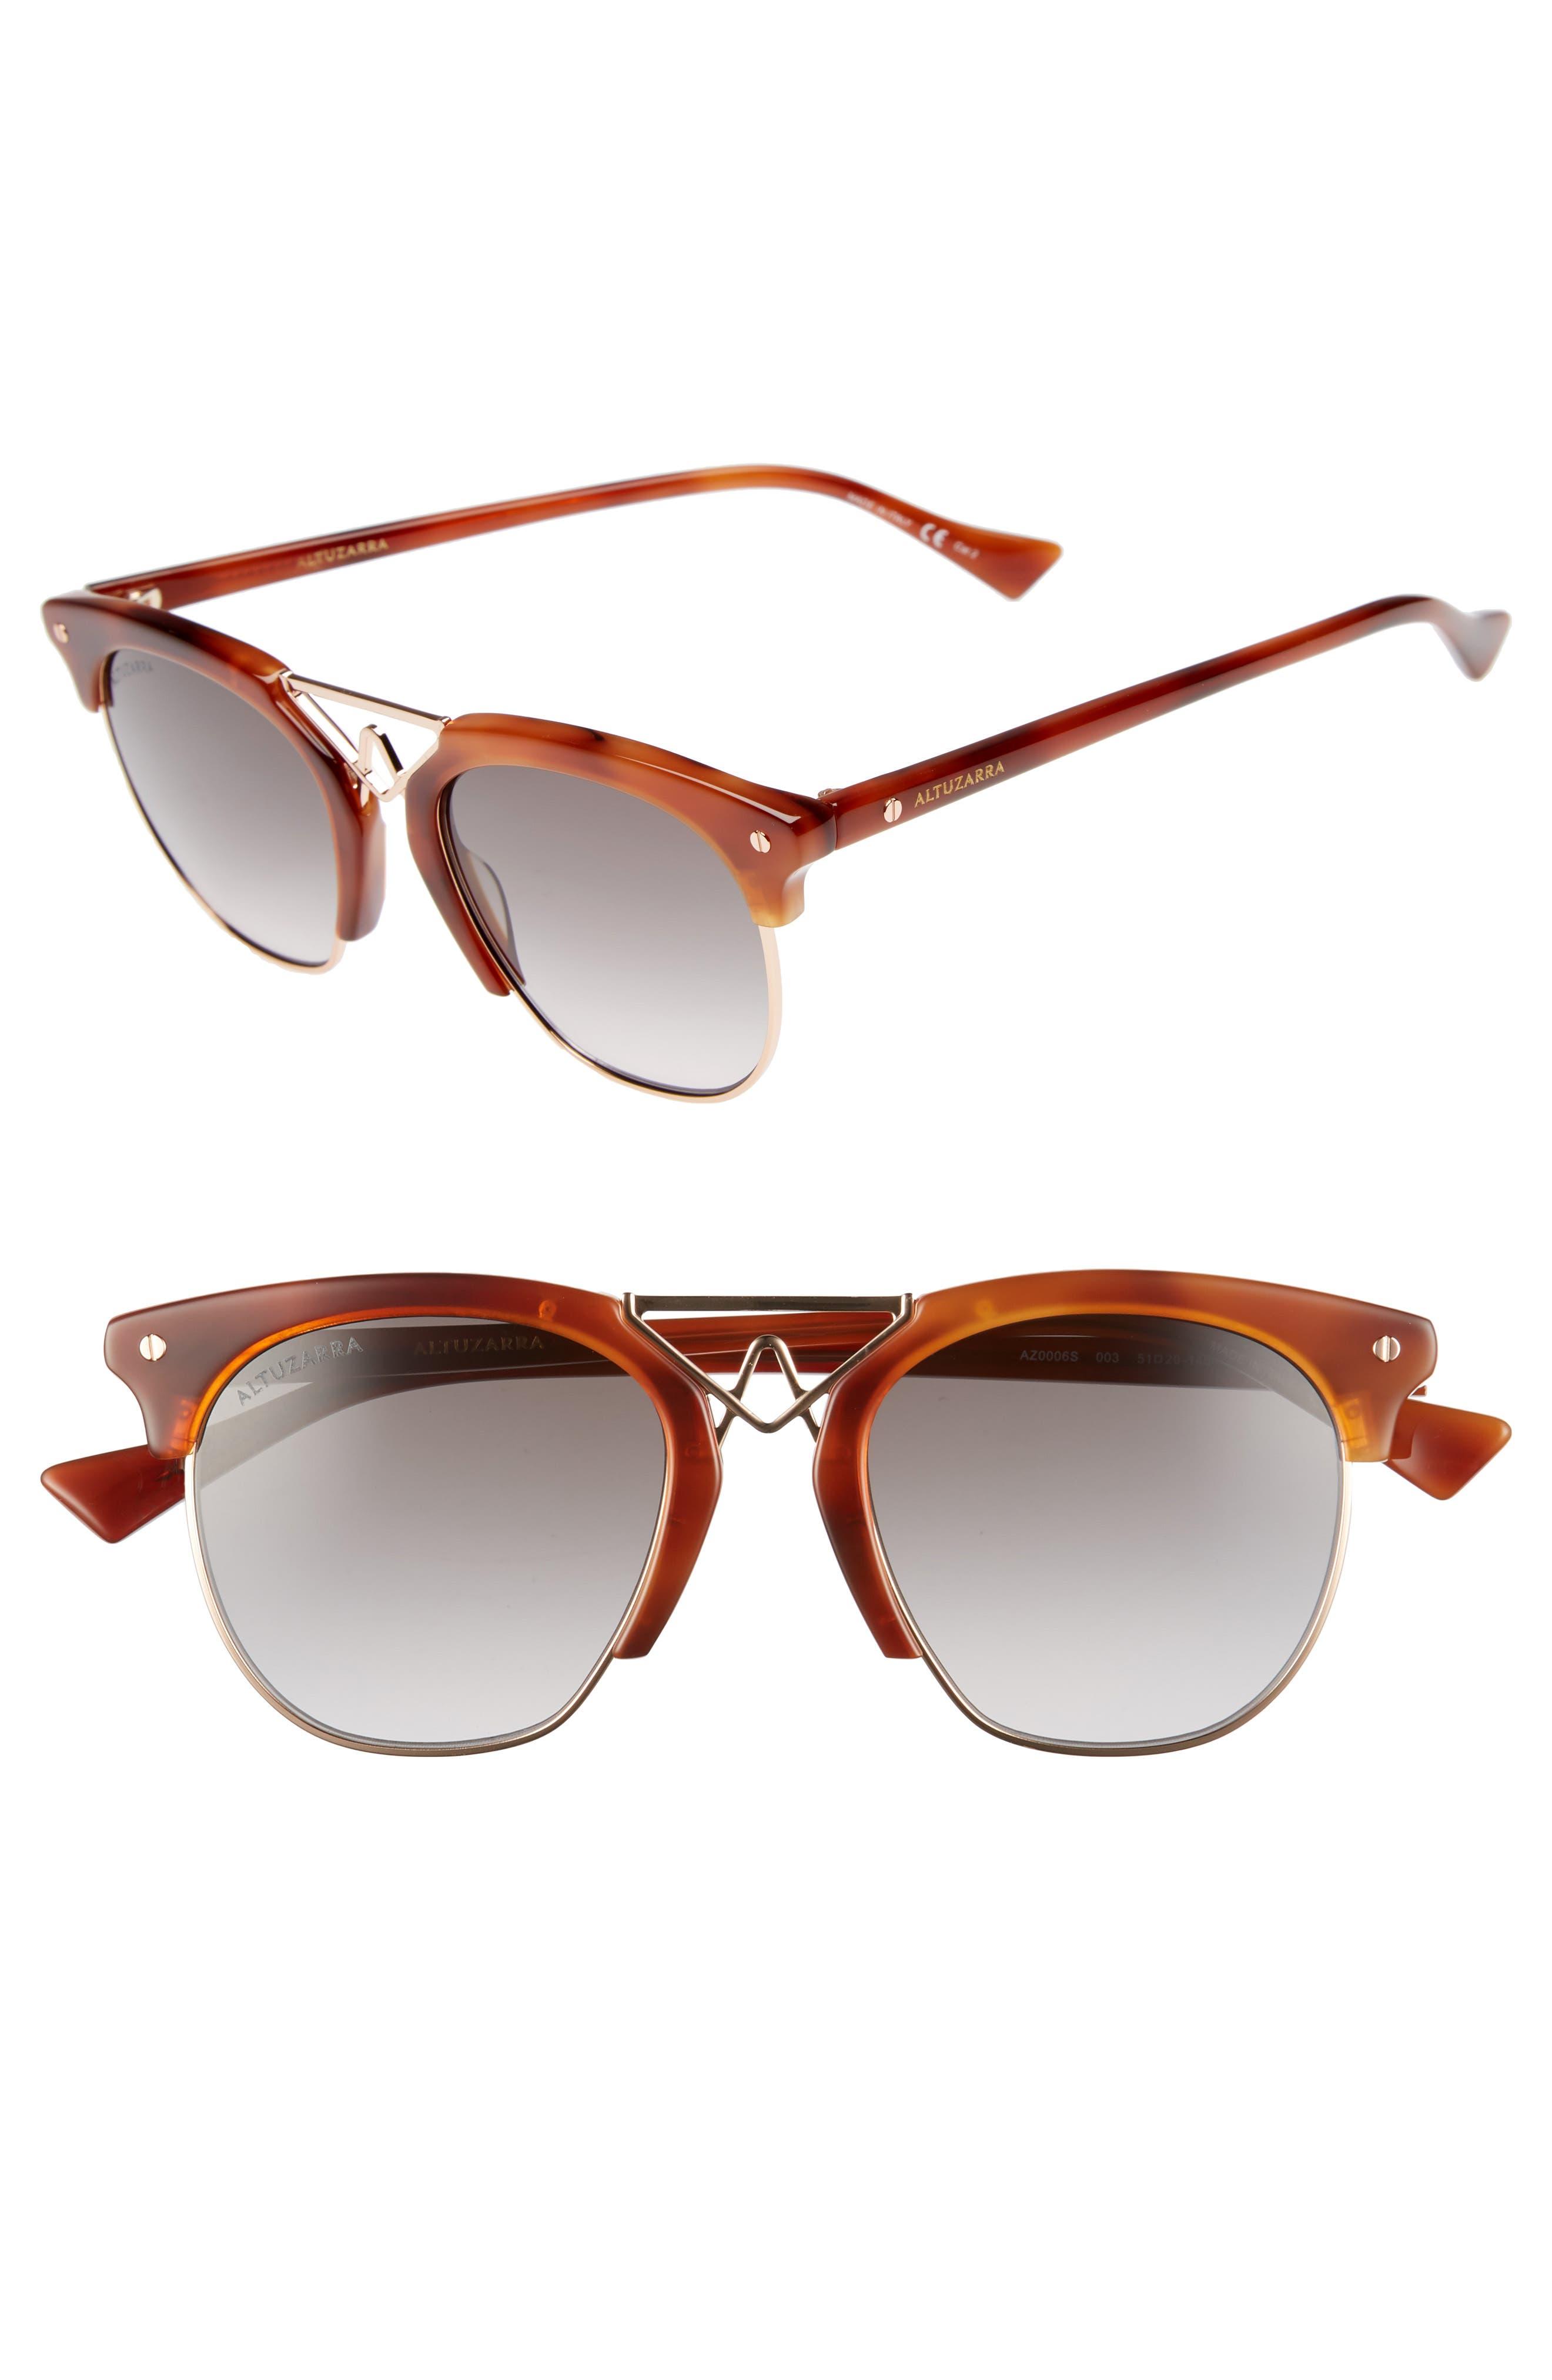 51mm Round Sunglasses,                             Main thumbnail 1, color,                             Havana